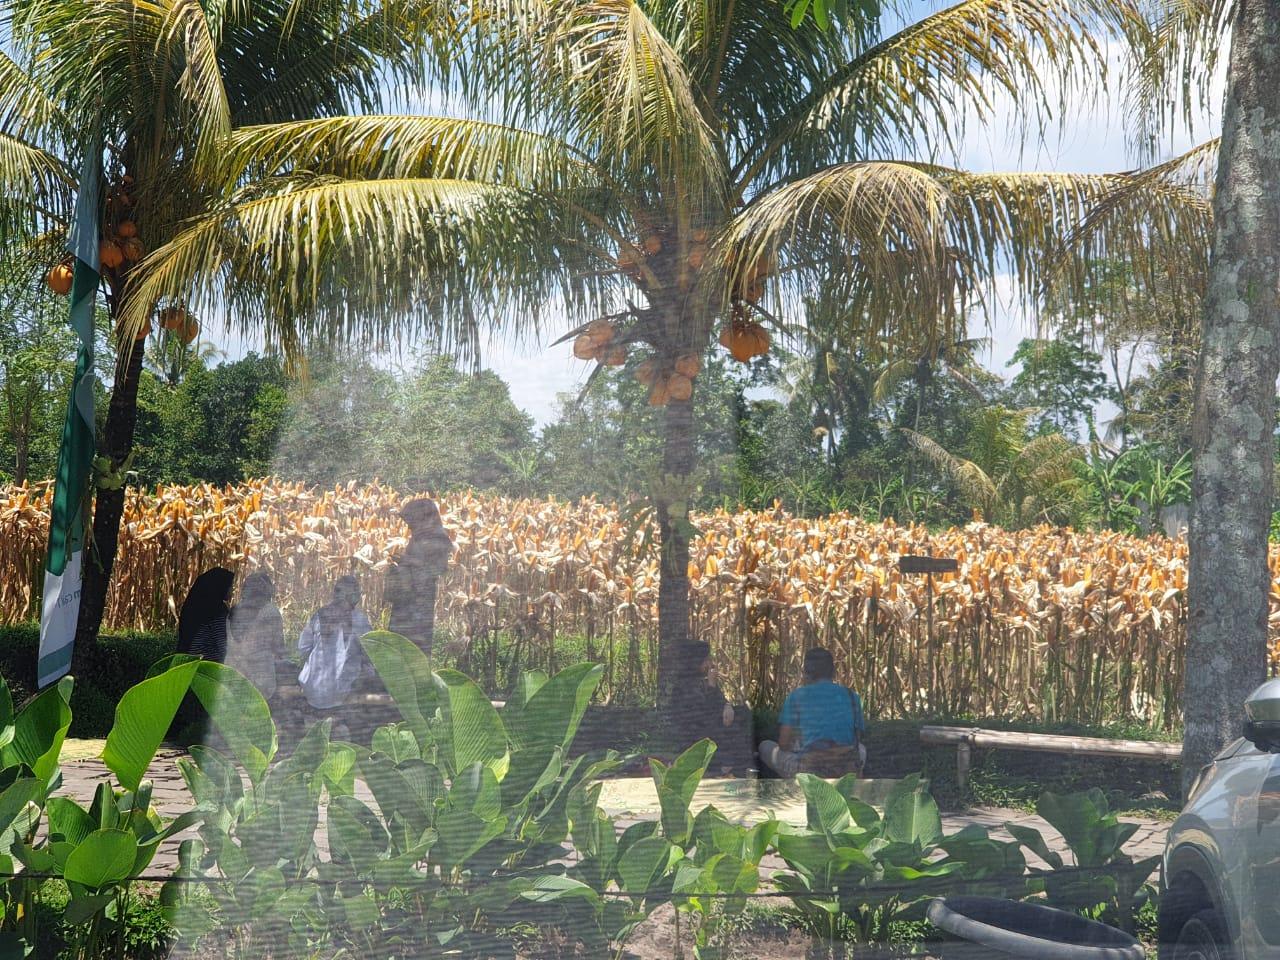 Warung Kopi Klotok Pakem, Wisata Kuliner Khas 'Ndeso' yang Sajikan Nuansa Pedesaan